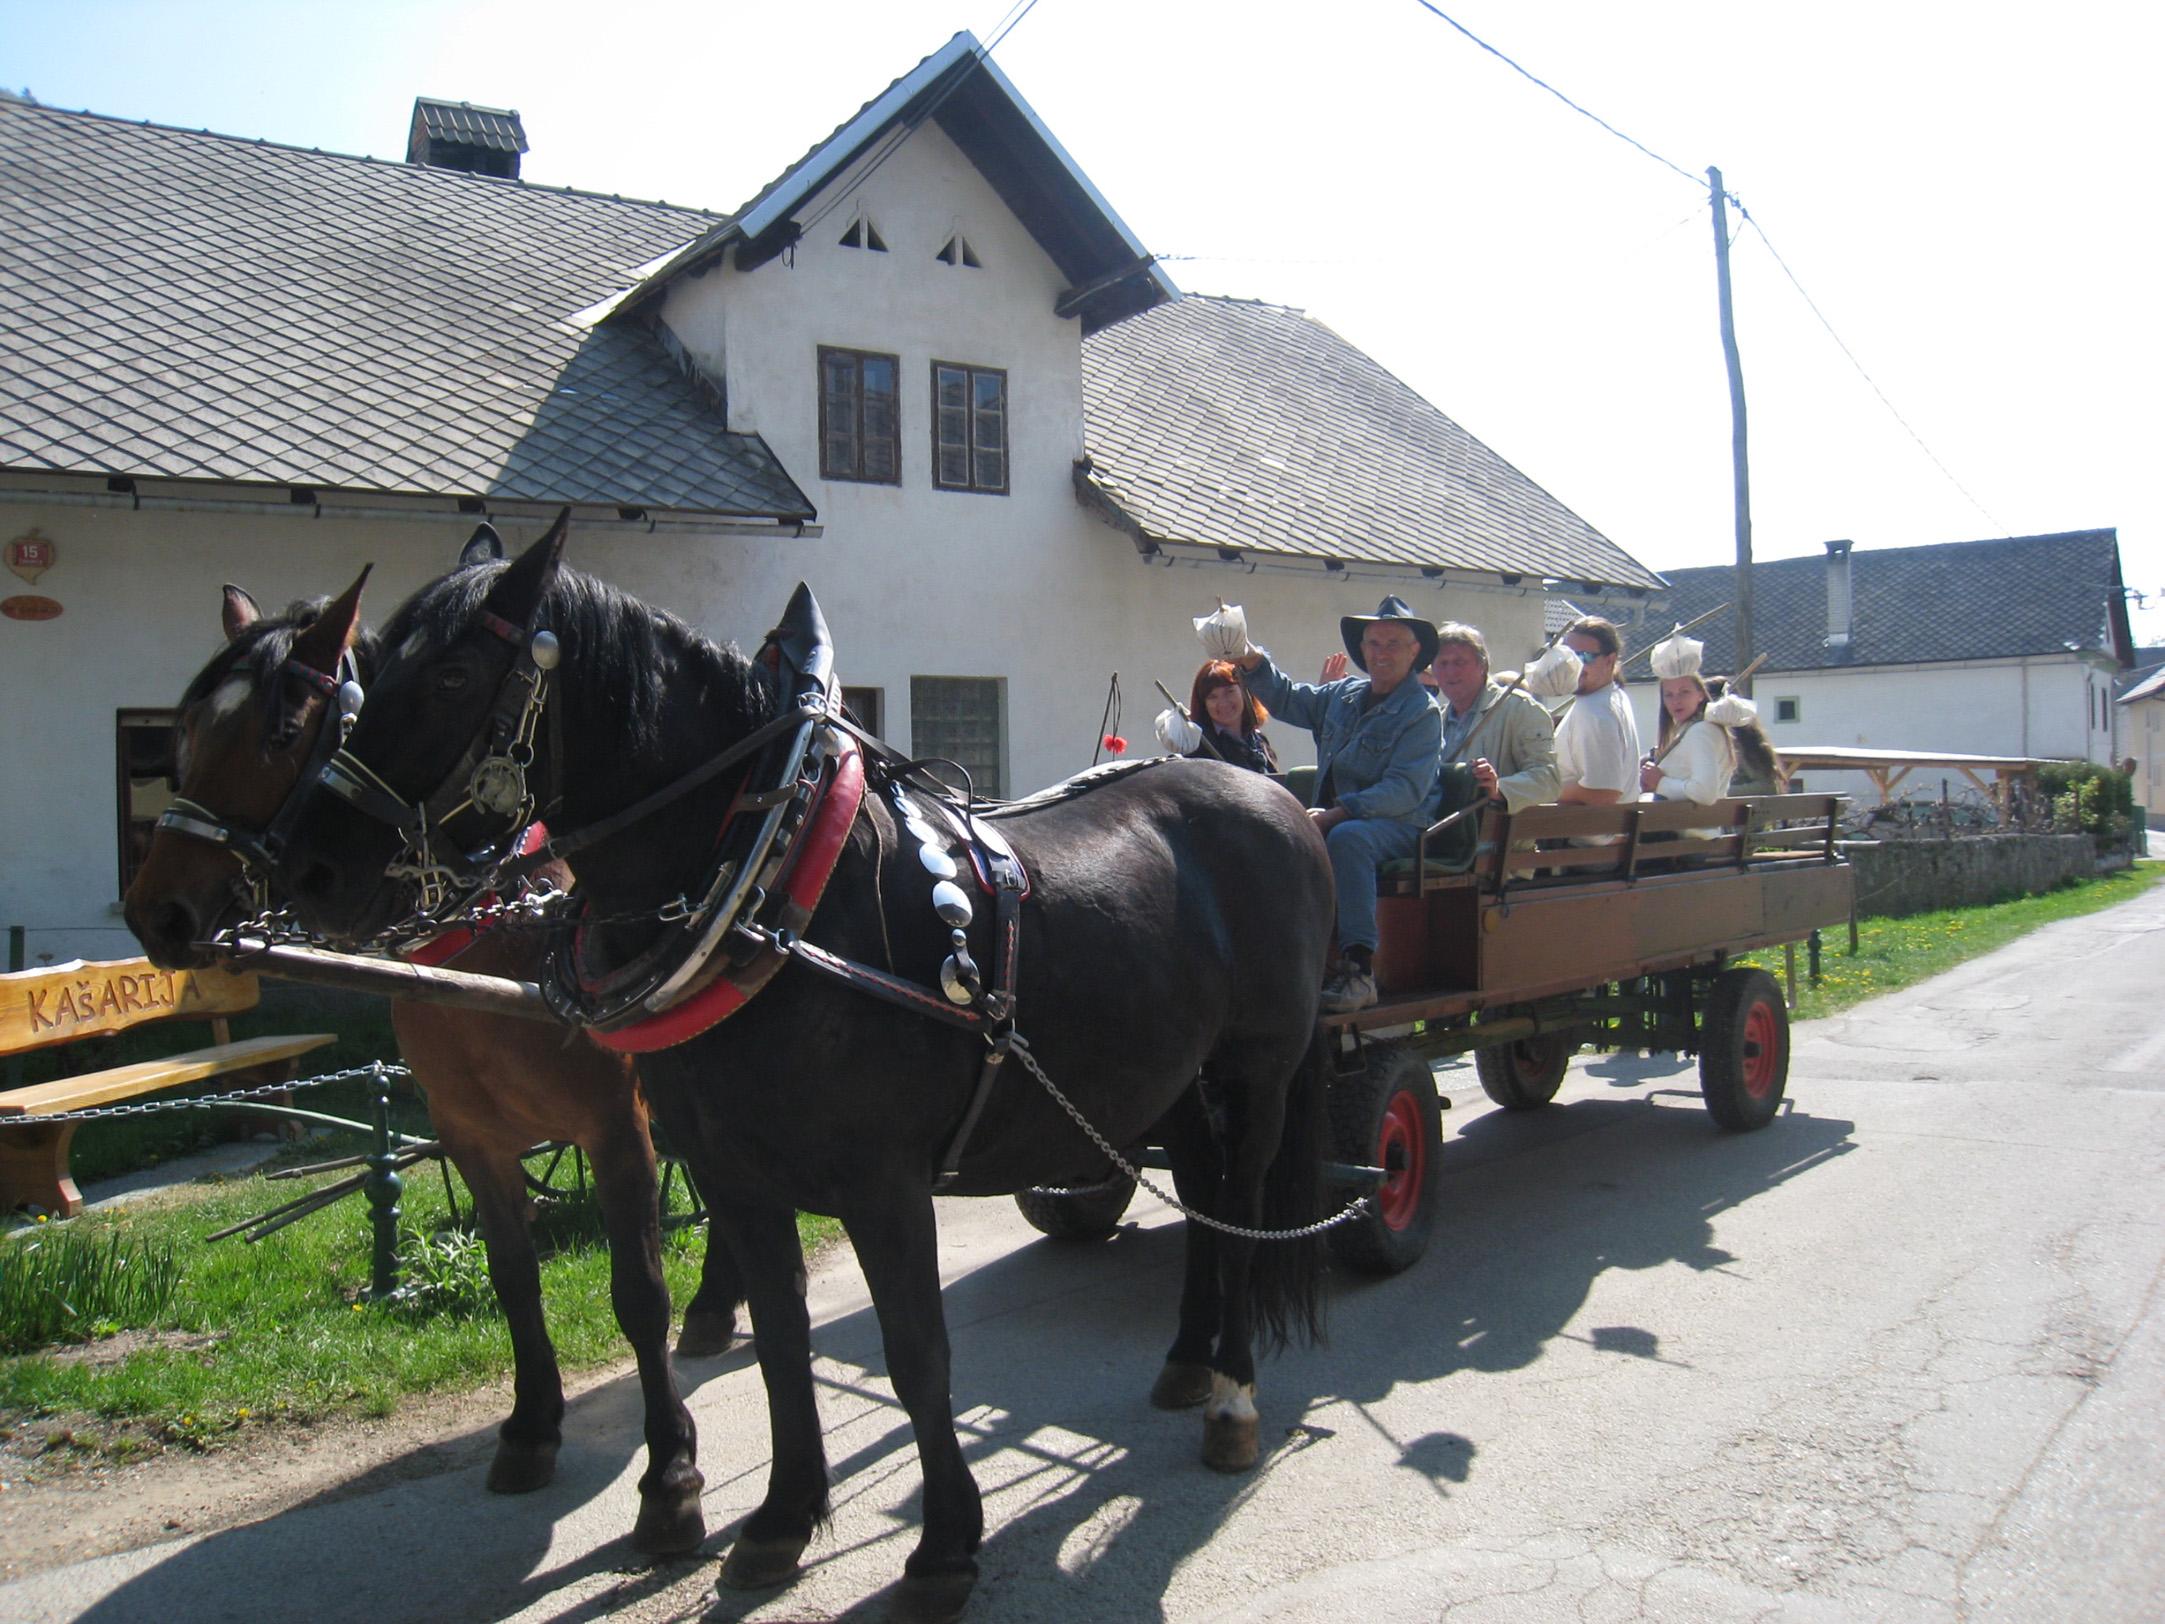 gorenjska 20.04.11., zirovnica, tur, foto: renata reneja skrjanc